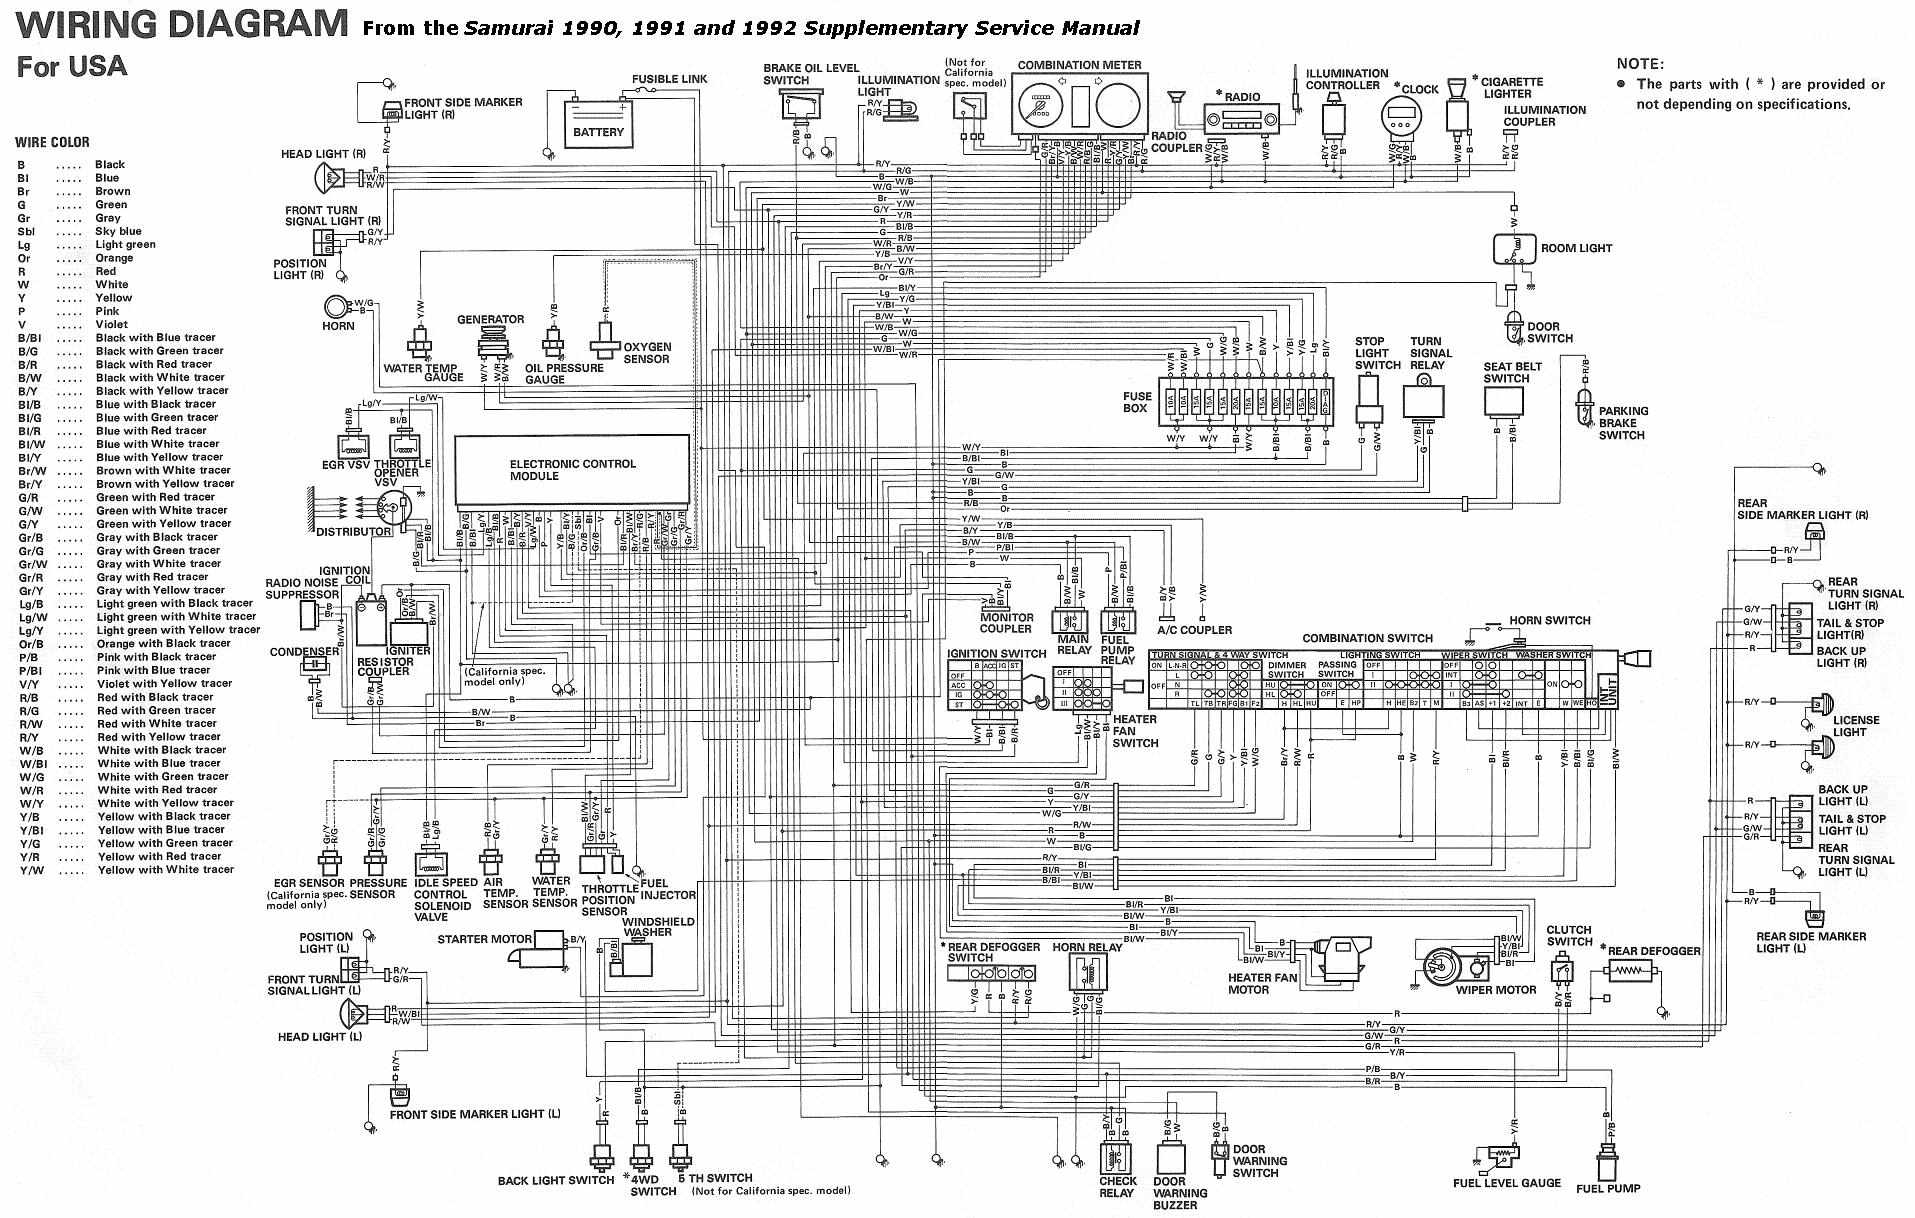 Suzuki Car Pdf Manual Wiring Diagram Fault Codes Dtc